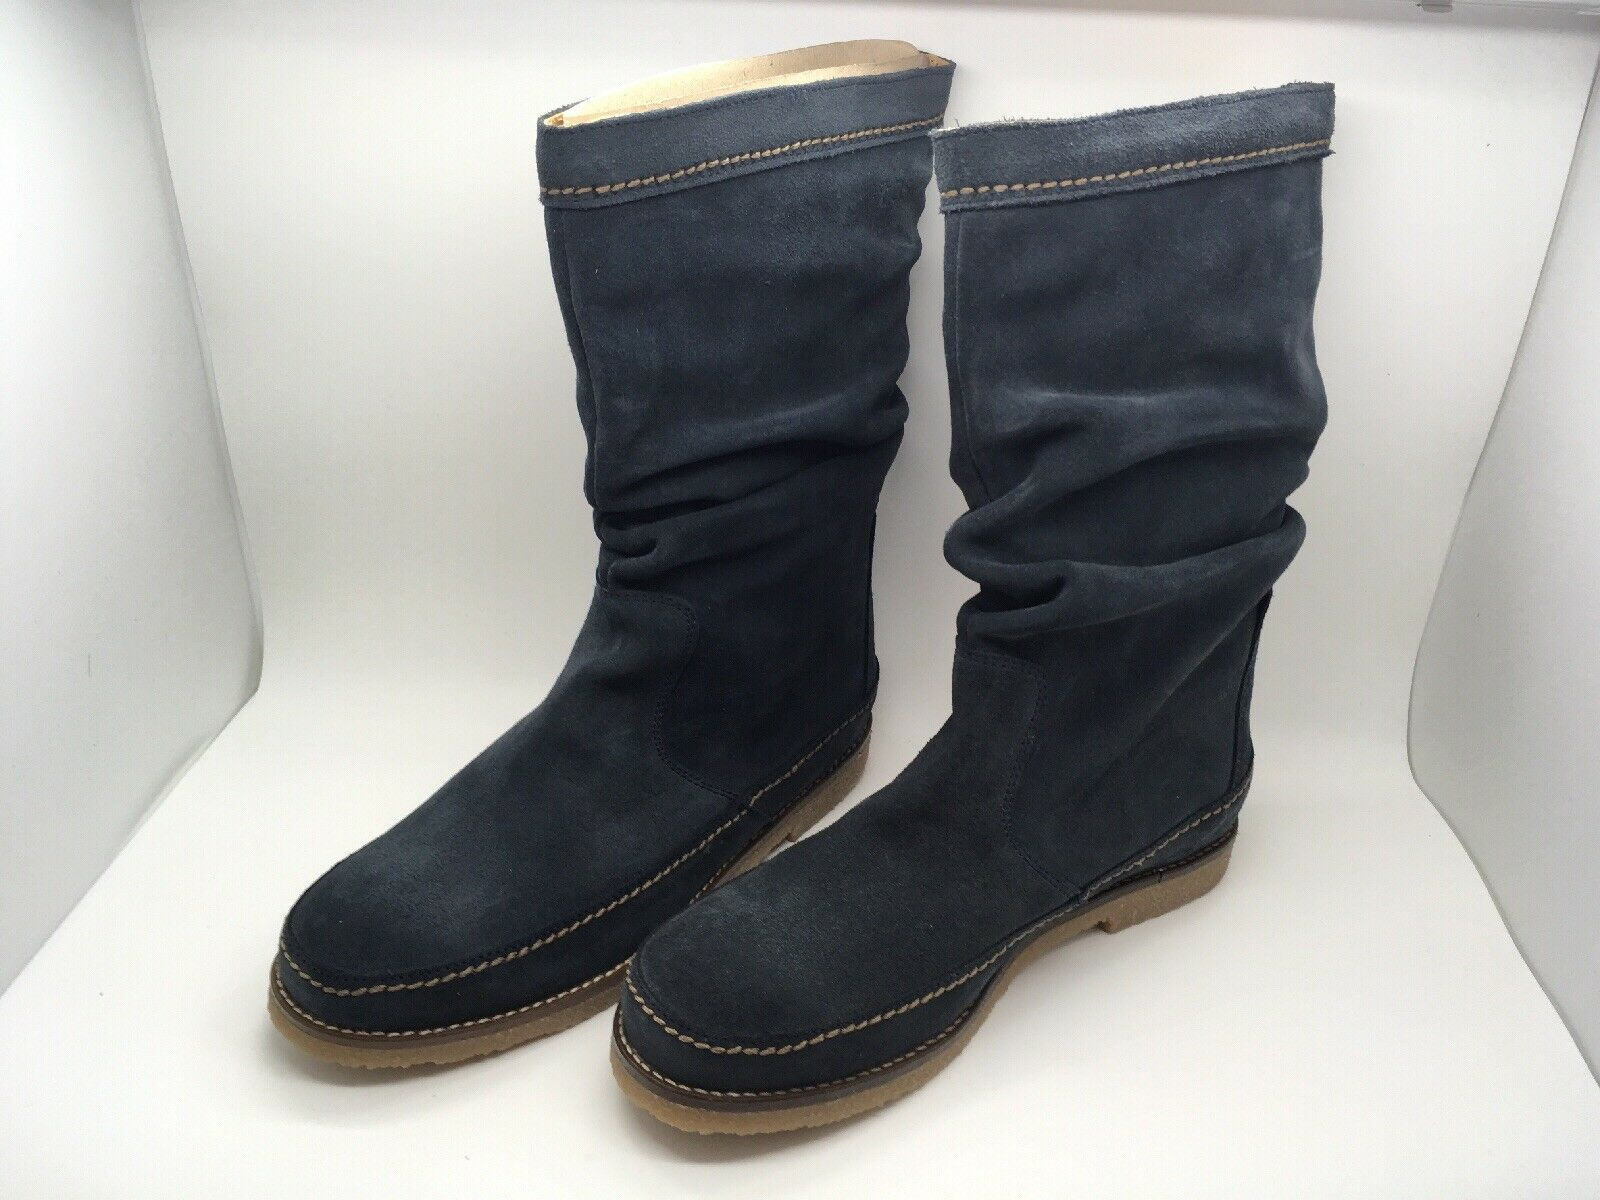 Stiefel TSB neu blaues Leder Größe 38 EUR   6.5 US